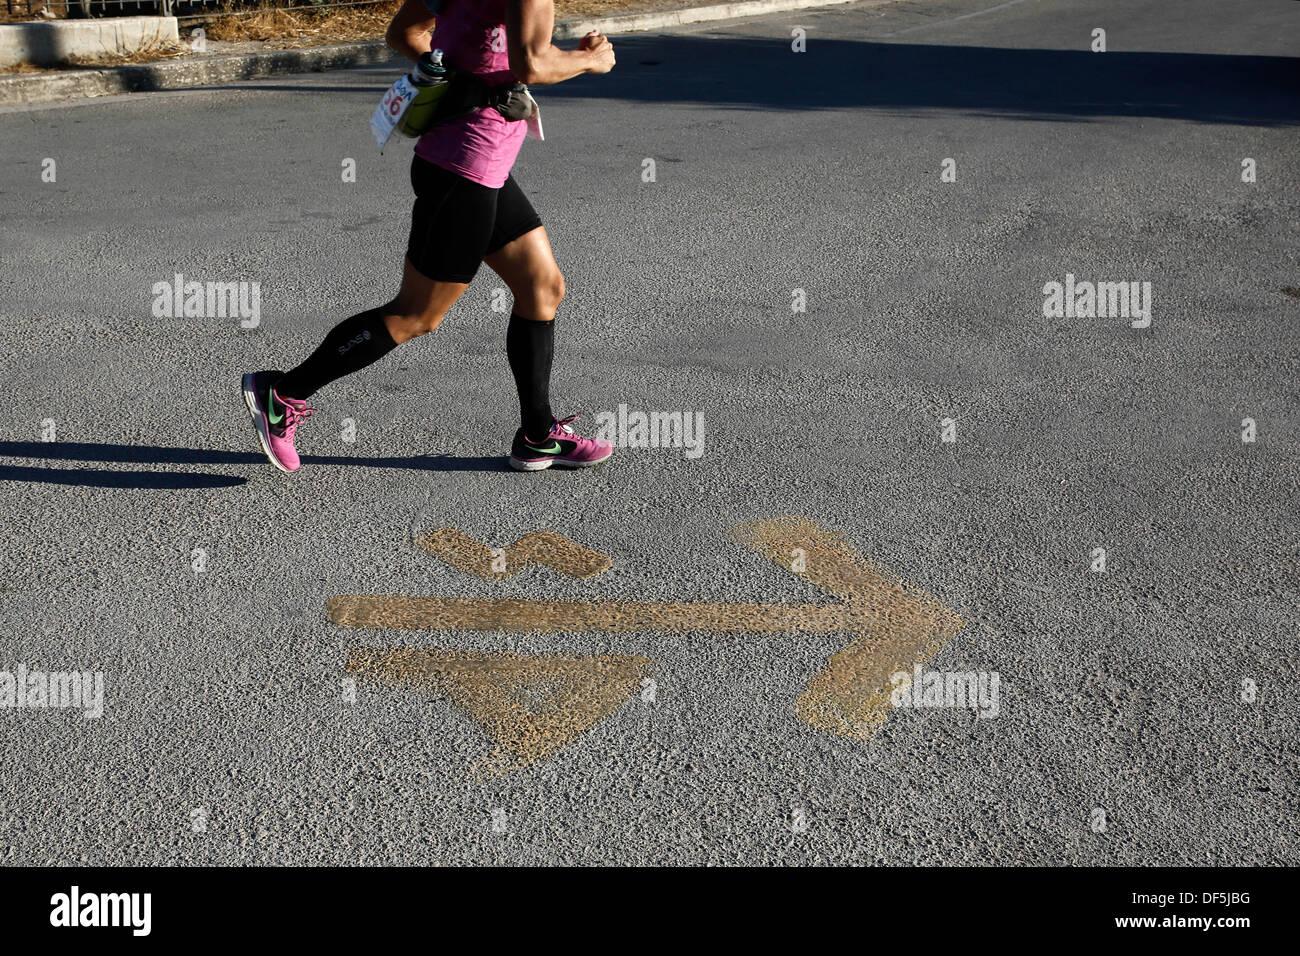 Sparta, Greece. 27th Sep, 2013. Ultramarathon Spartathlon 2013. Greece on September 27, 2013. © Konstantinos Tsakalidis/Alamy Live News - Stock Image